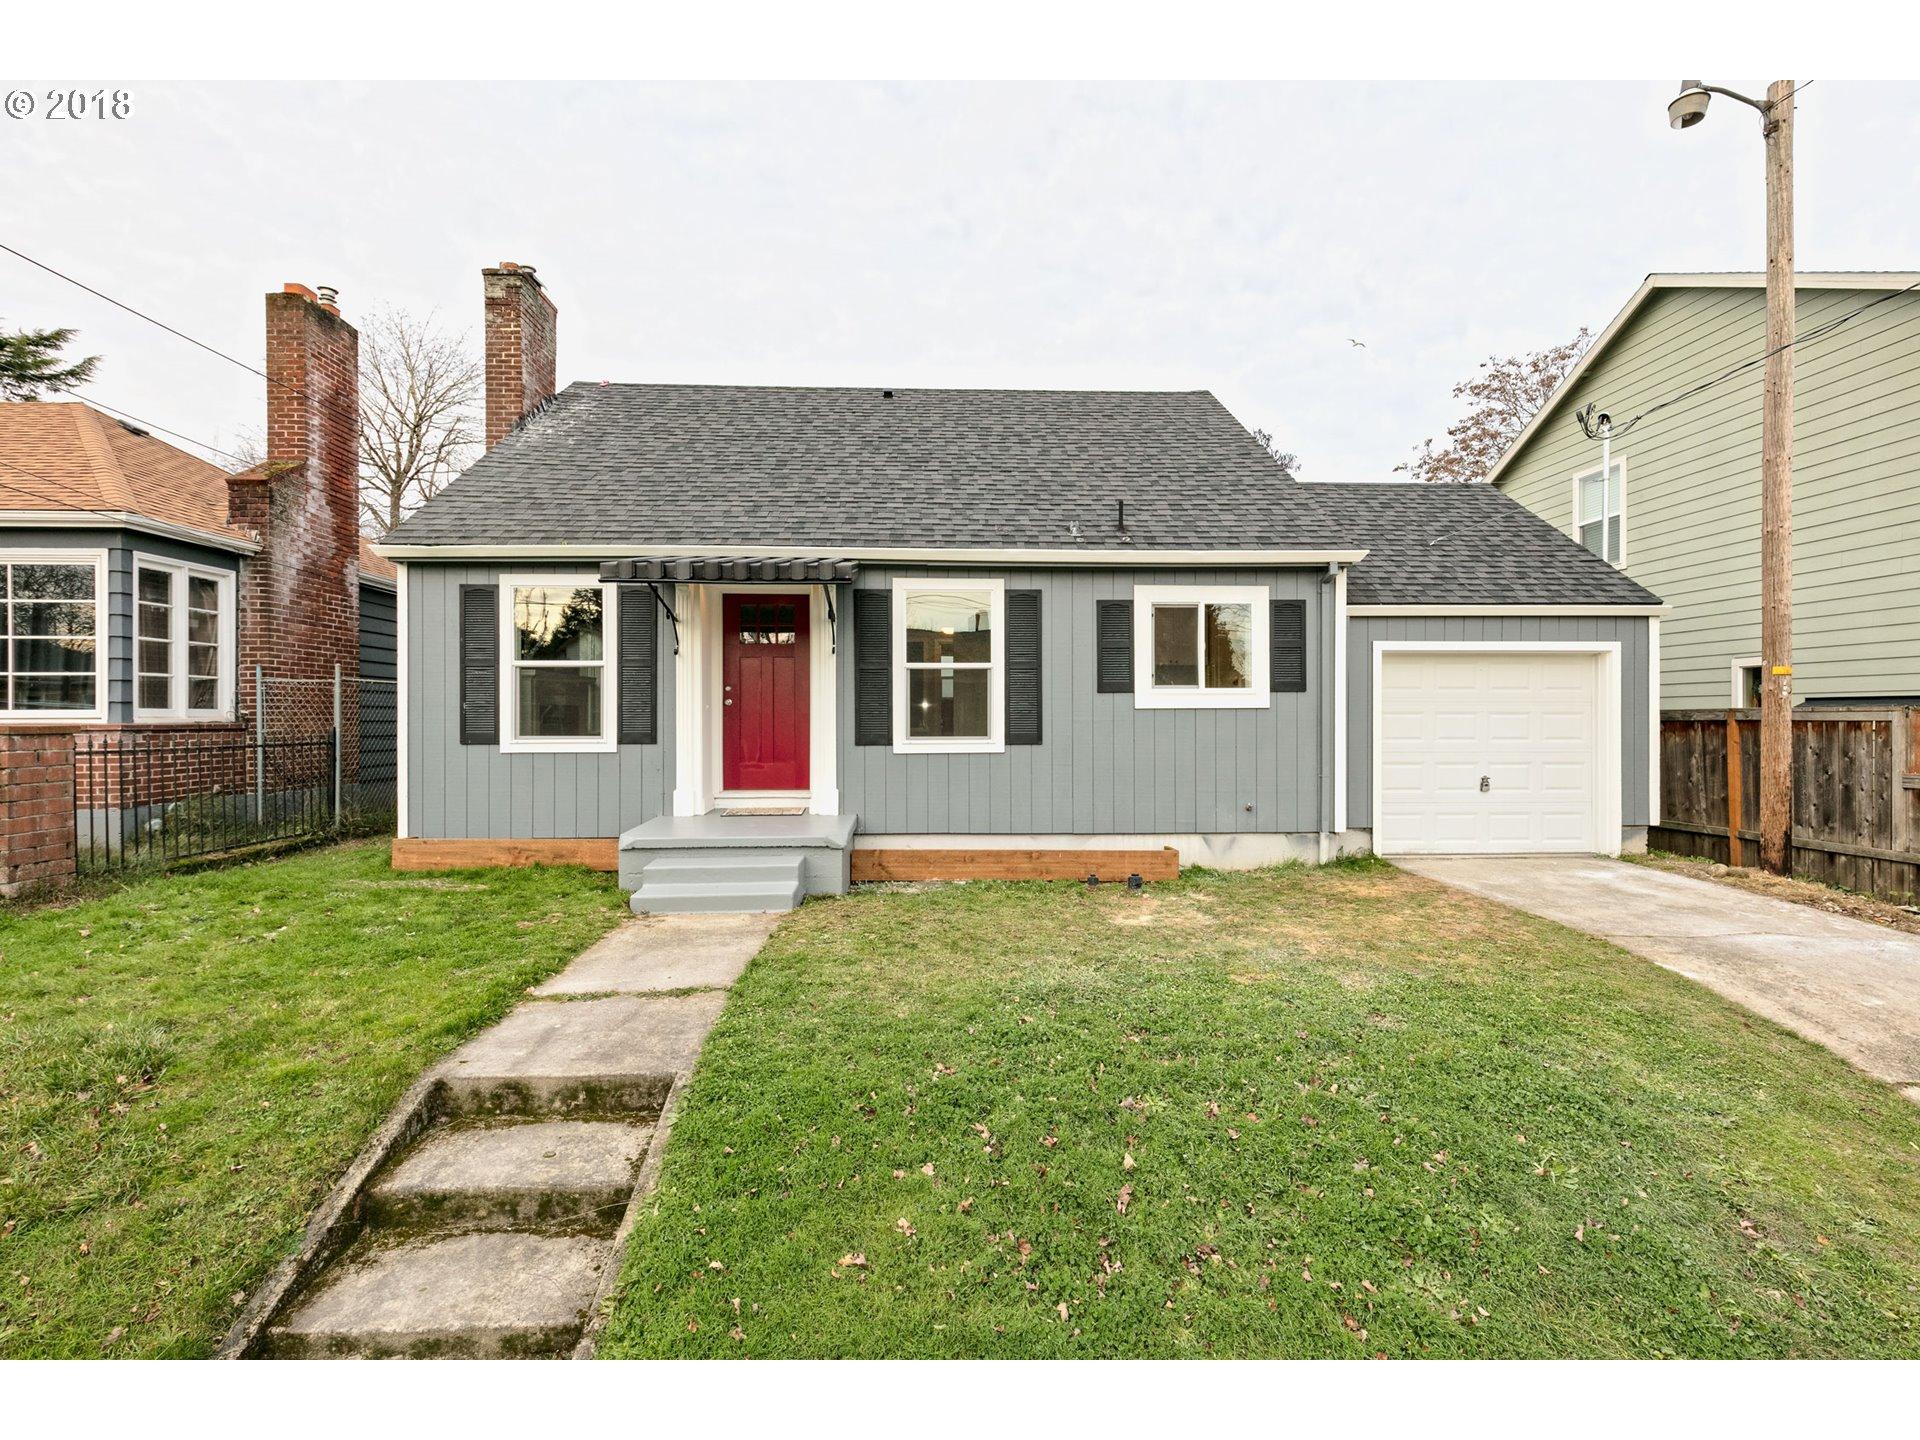 6455 NE 7TH AVE Portland, OR 97211 - MLS #: 18152856